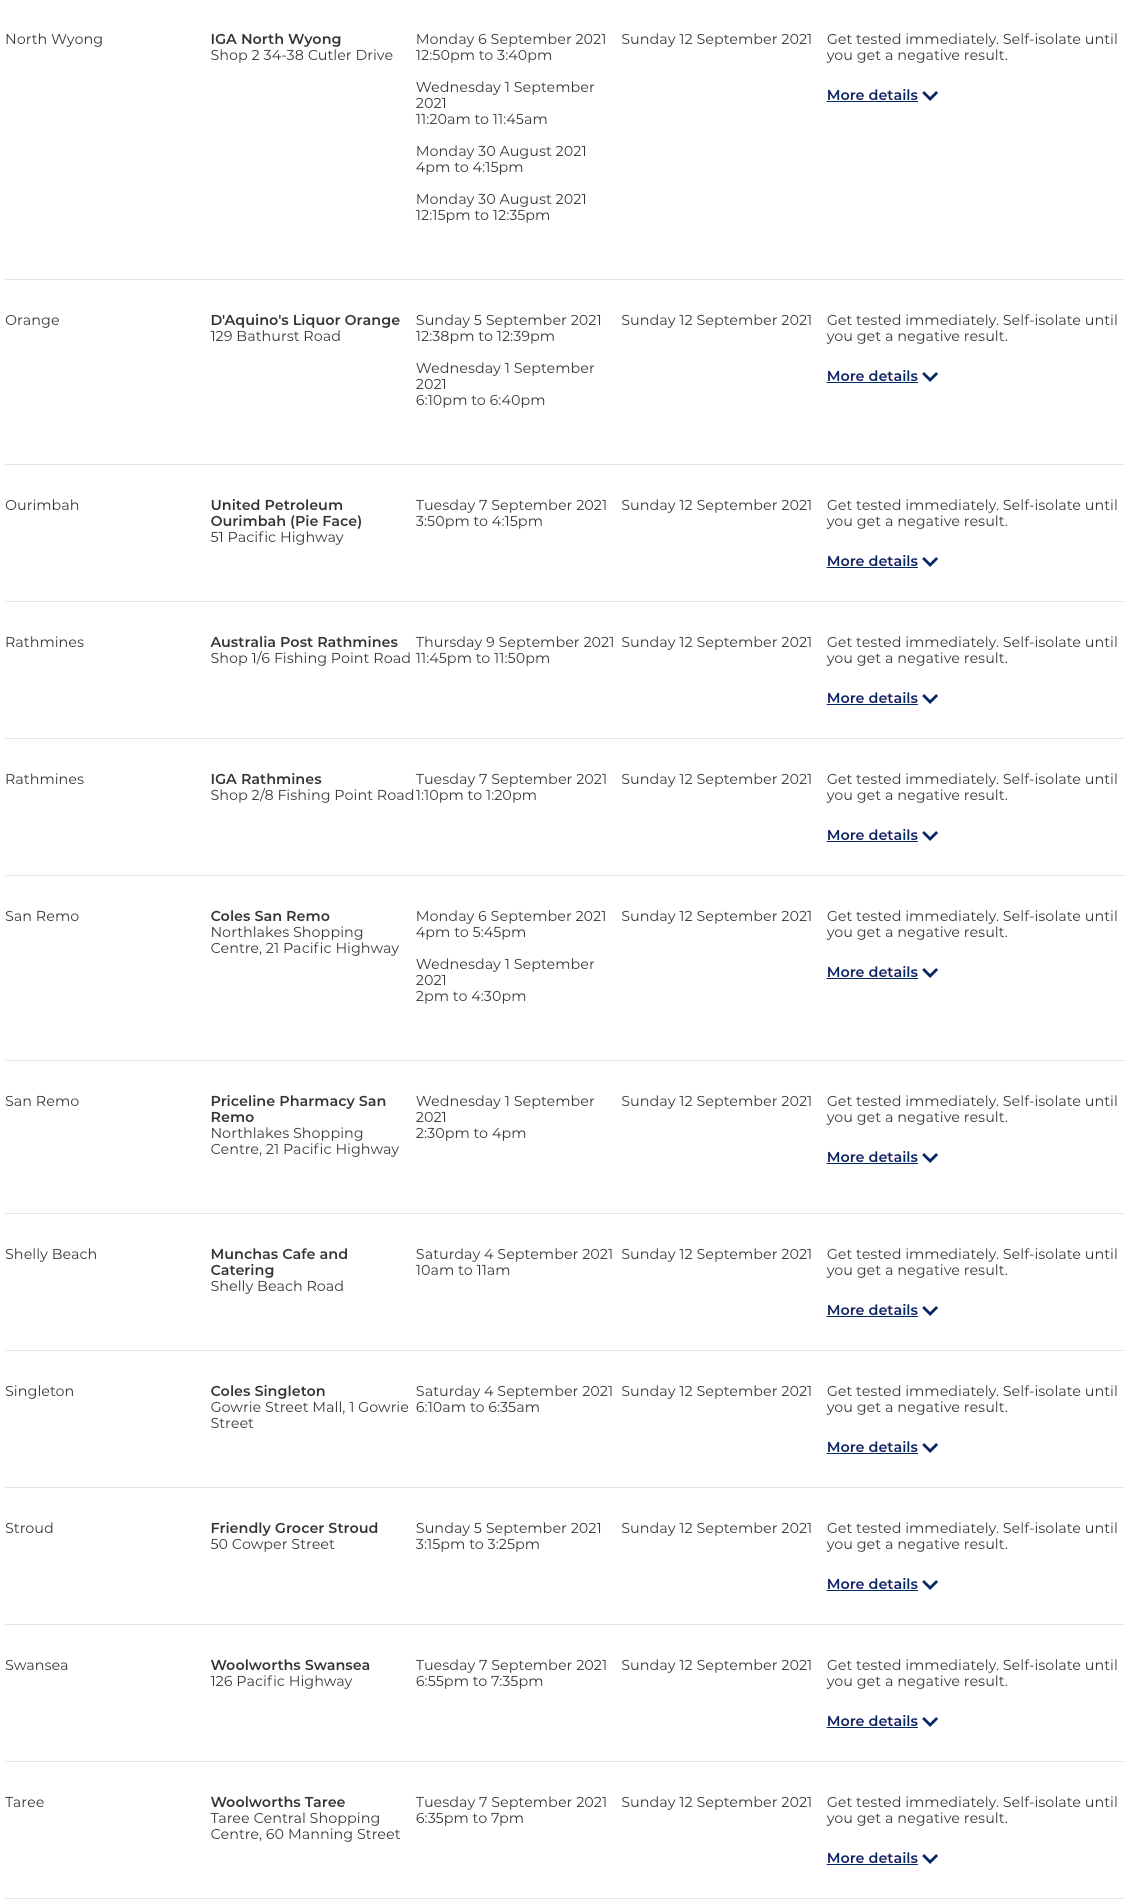 www.nsw.gov.au_covid-19_nsw-covid-19-case-locations_case-locations (27).png